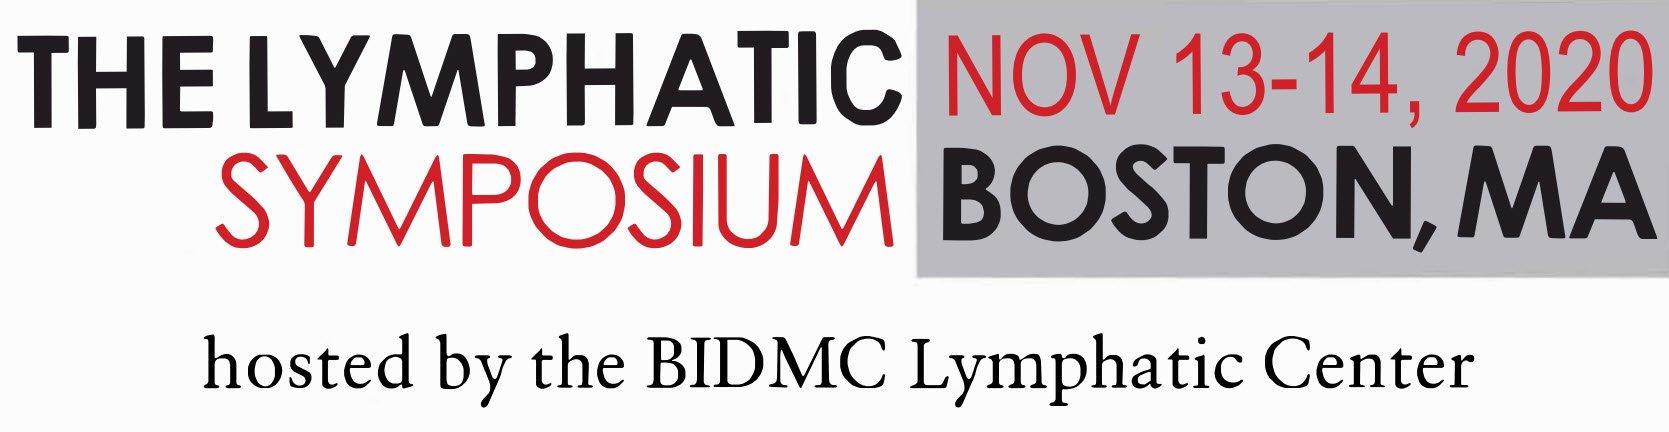 2020 Lymphatic Symposium header